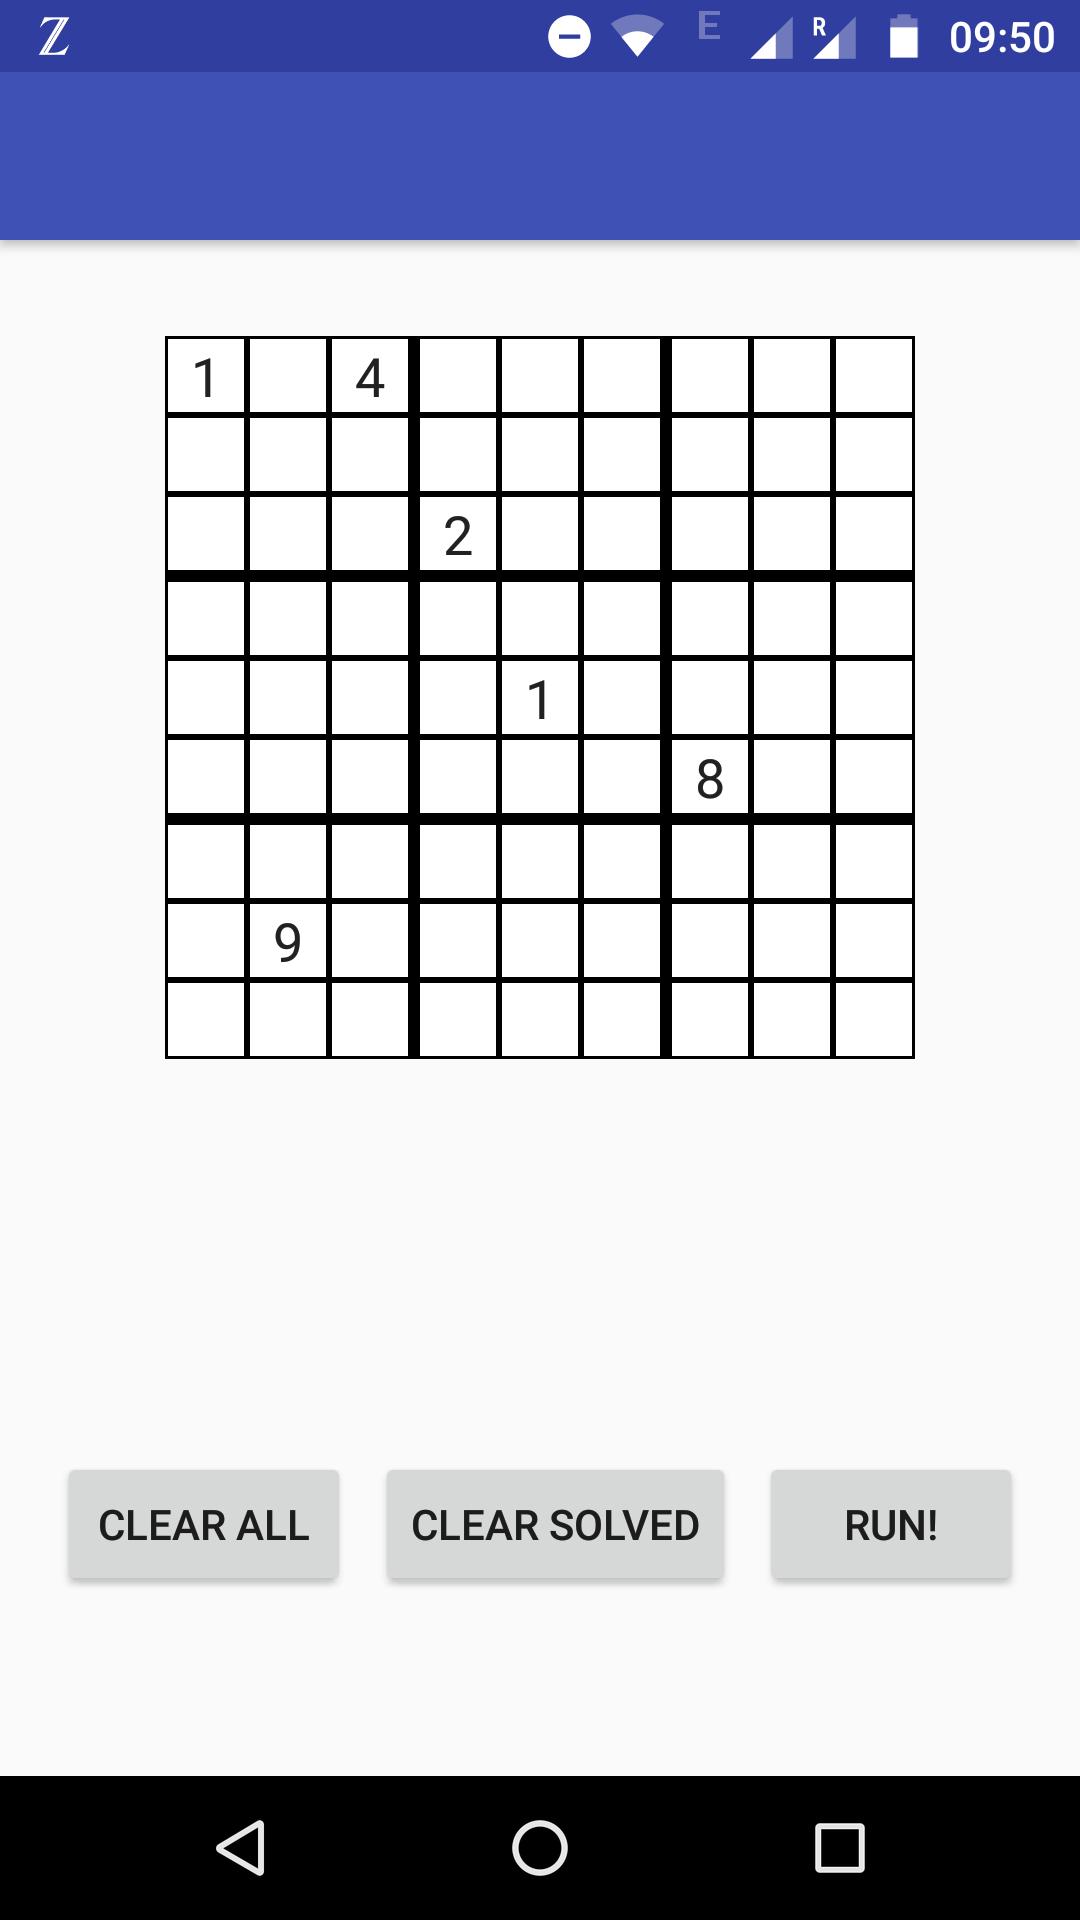 sudoku solver paul rubenstein